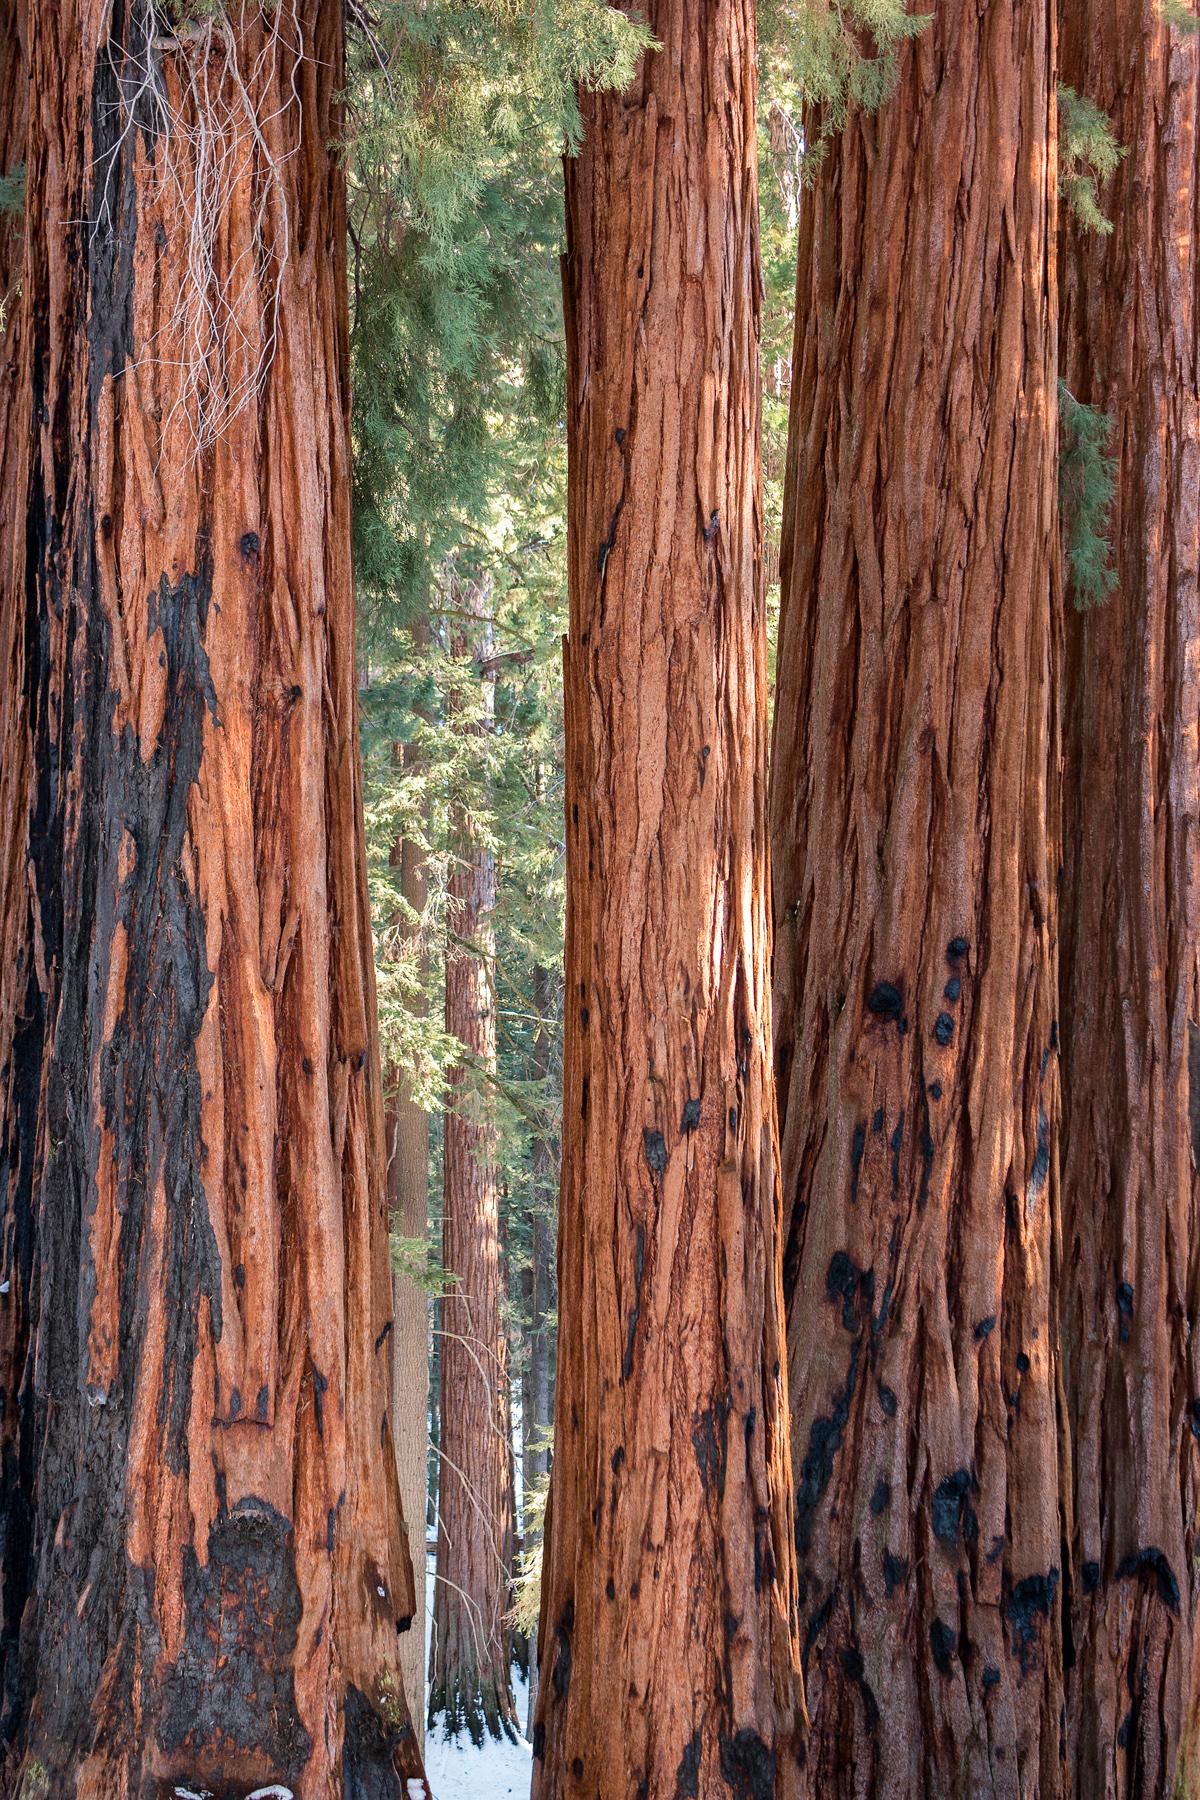 Wasim Muklashy Photography_Sequoia National Park_California_December 2015_-SAM_4014-Edit.jpg